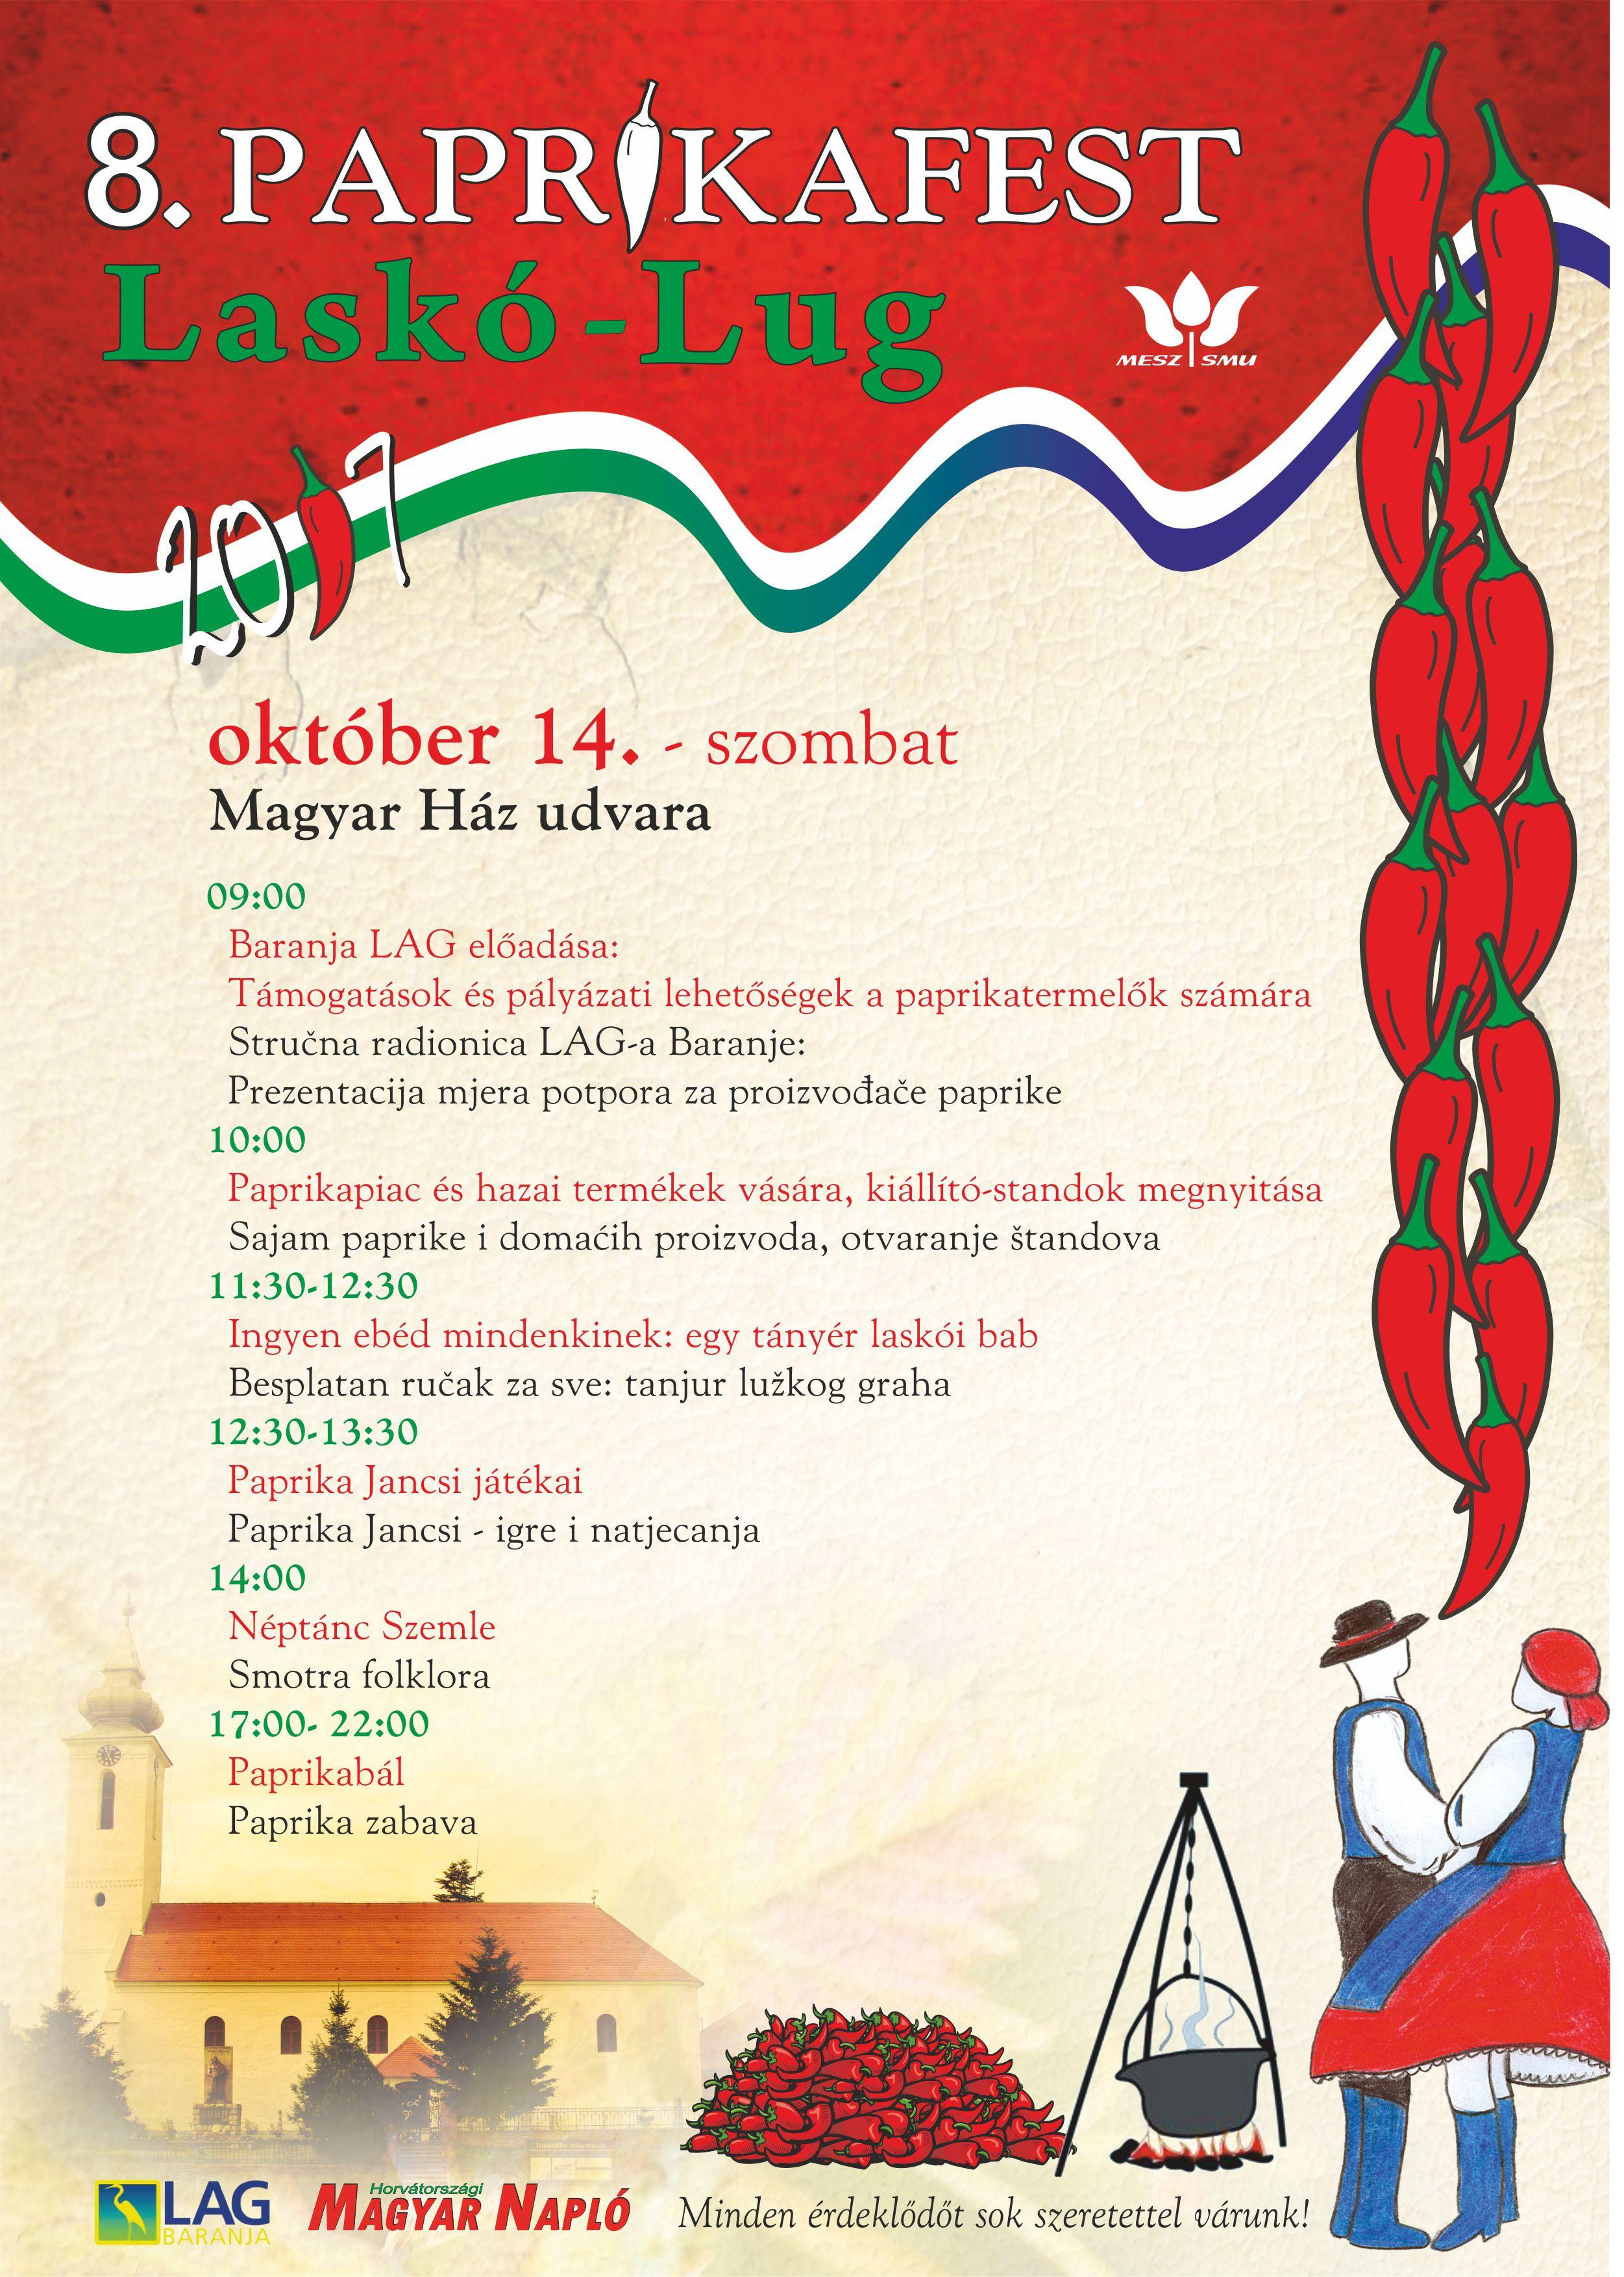 Plakat Paprikafest 2017